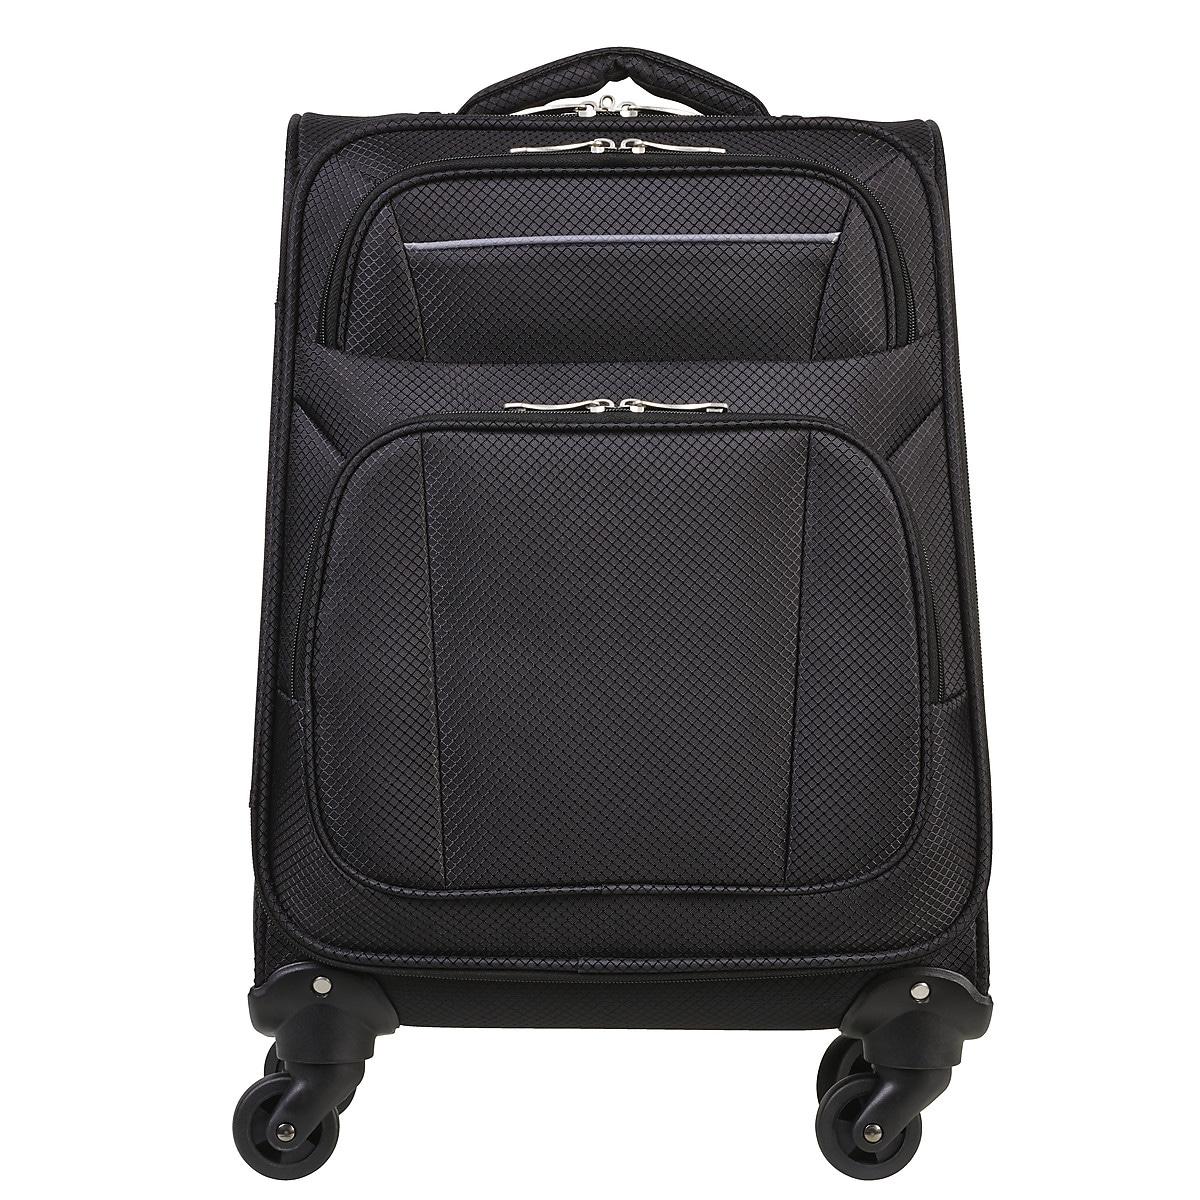 Resväska Asaklitt Lightweight svart